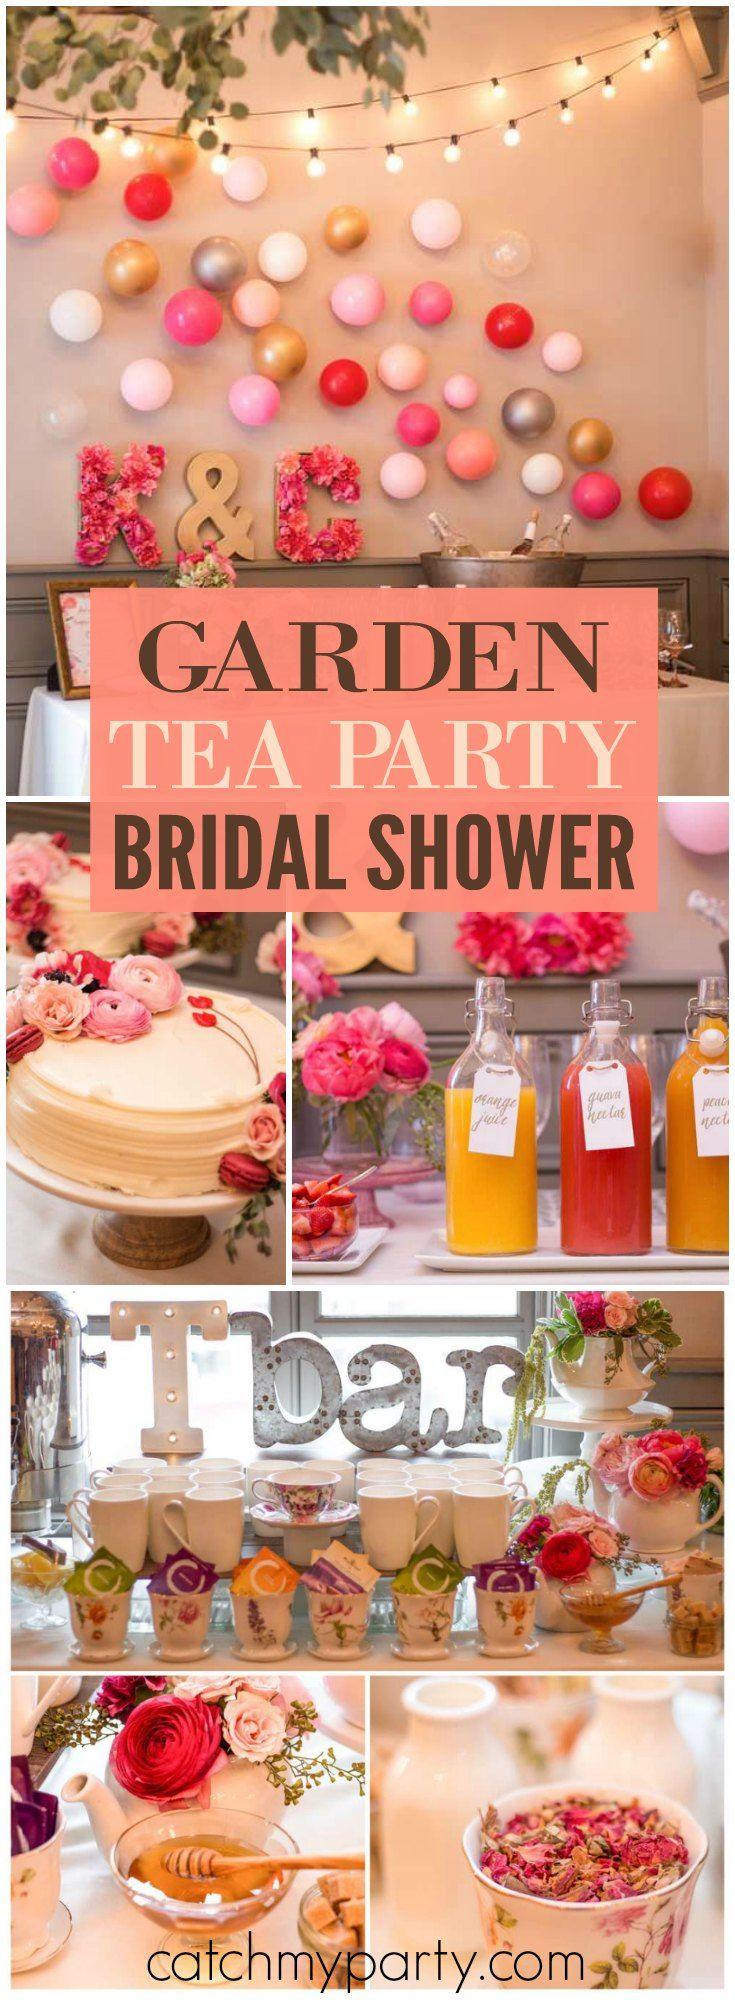 Garden Tea Party BridalWedding Shower Kimberlyu0027